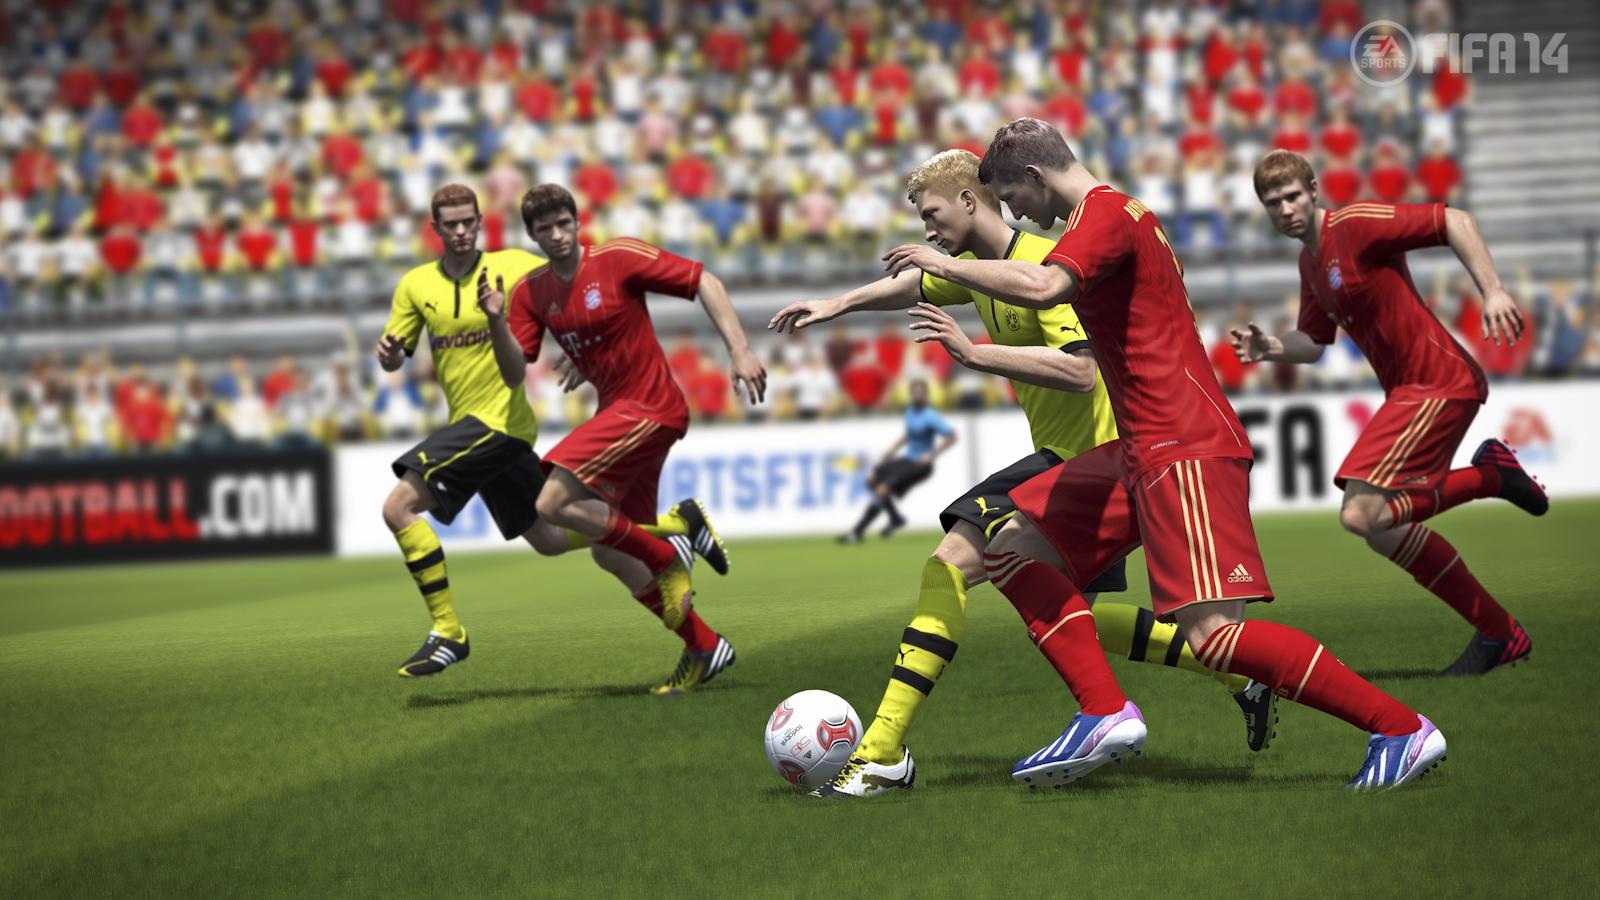 FIFA_14_Screenshots_03